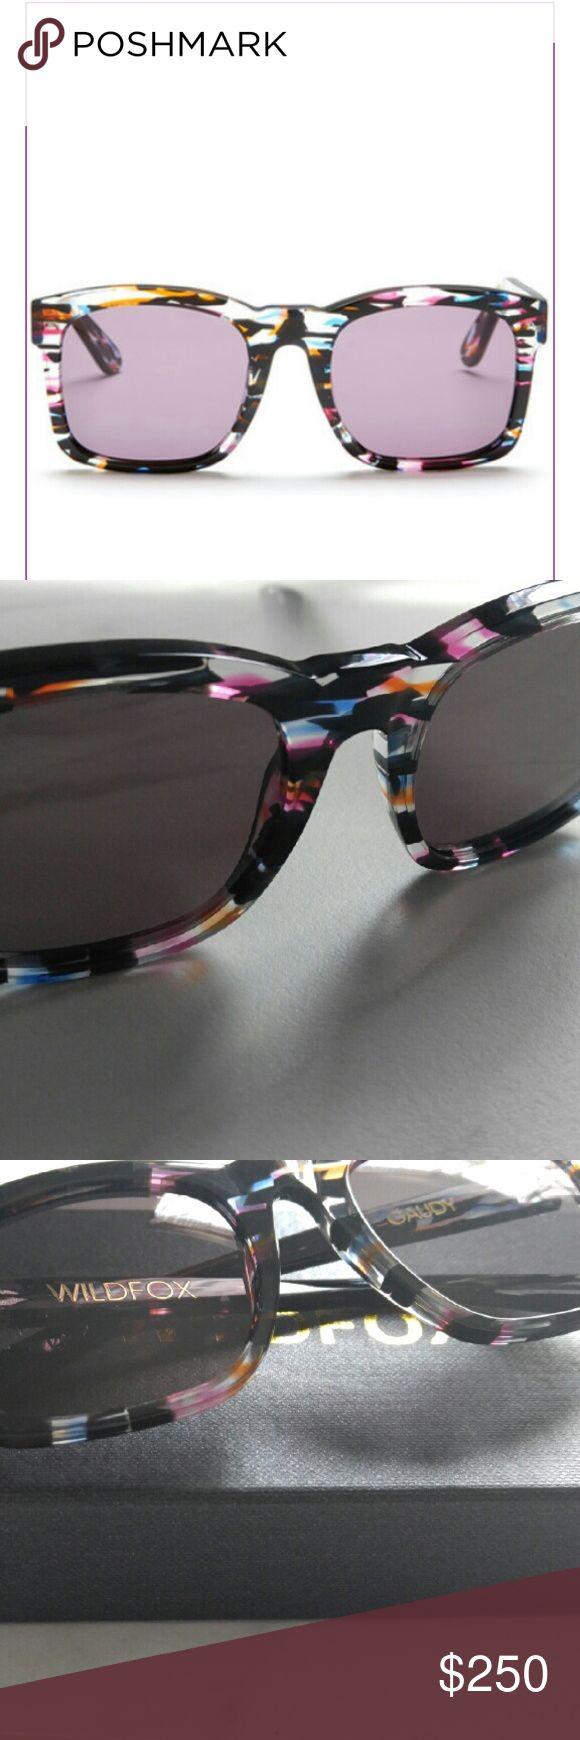 New Wildfox Gaudy Rectangle Sunglasses Brand New Wildfox Gaudy Rectangle Sunglasses  Color: FIREWORKS Wildfox Accessories Sunglasses